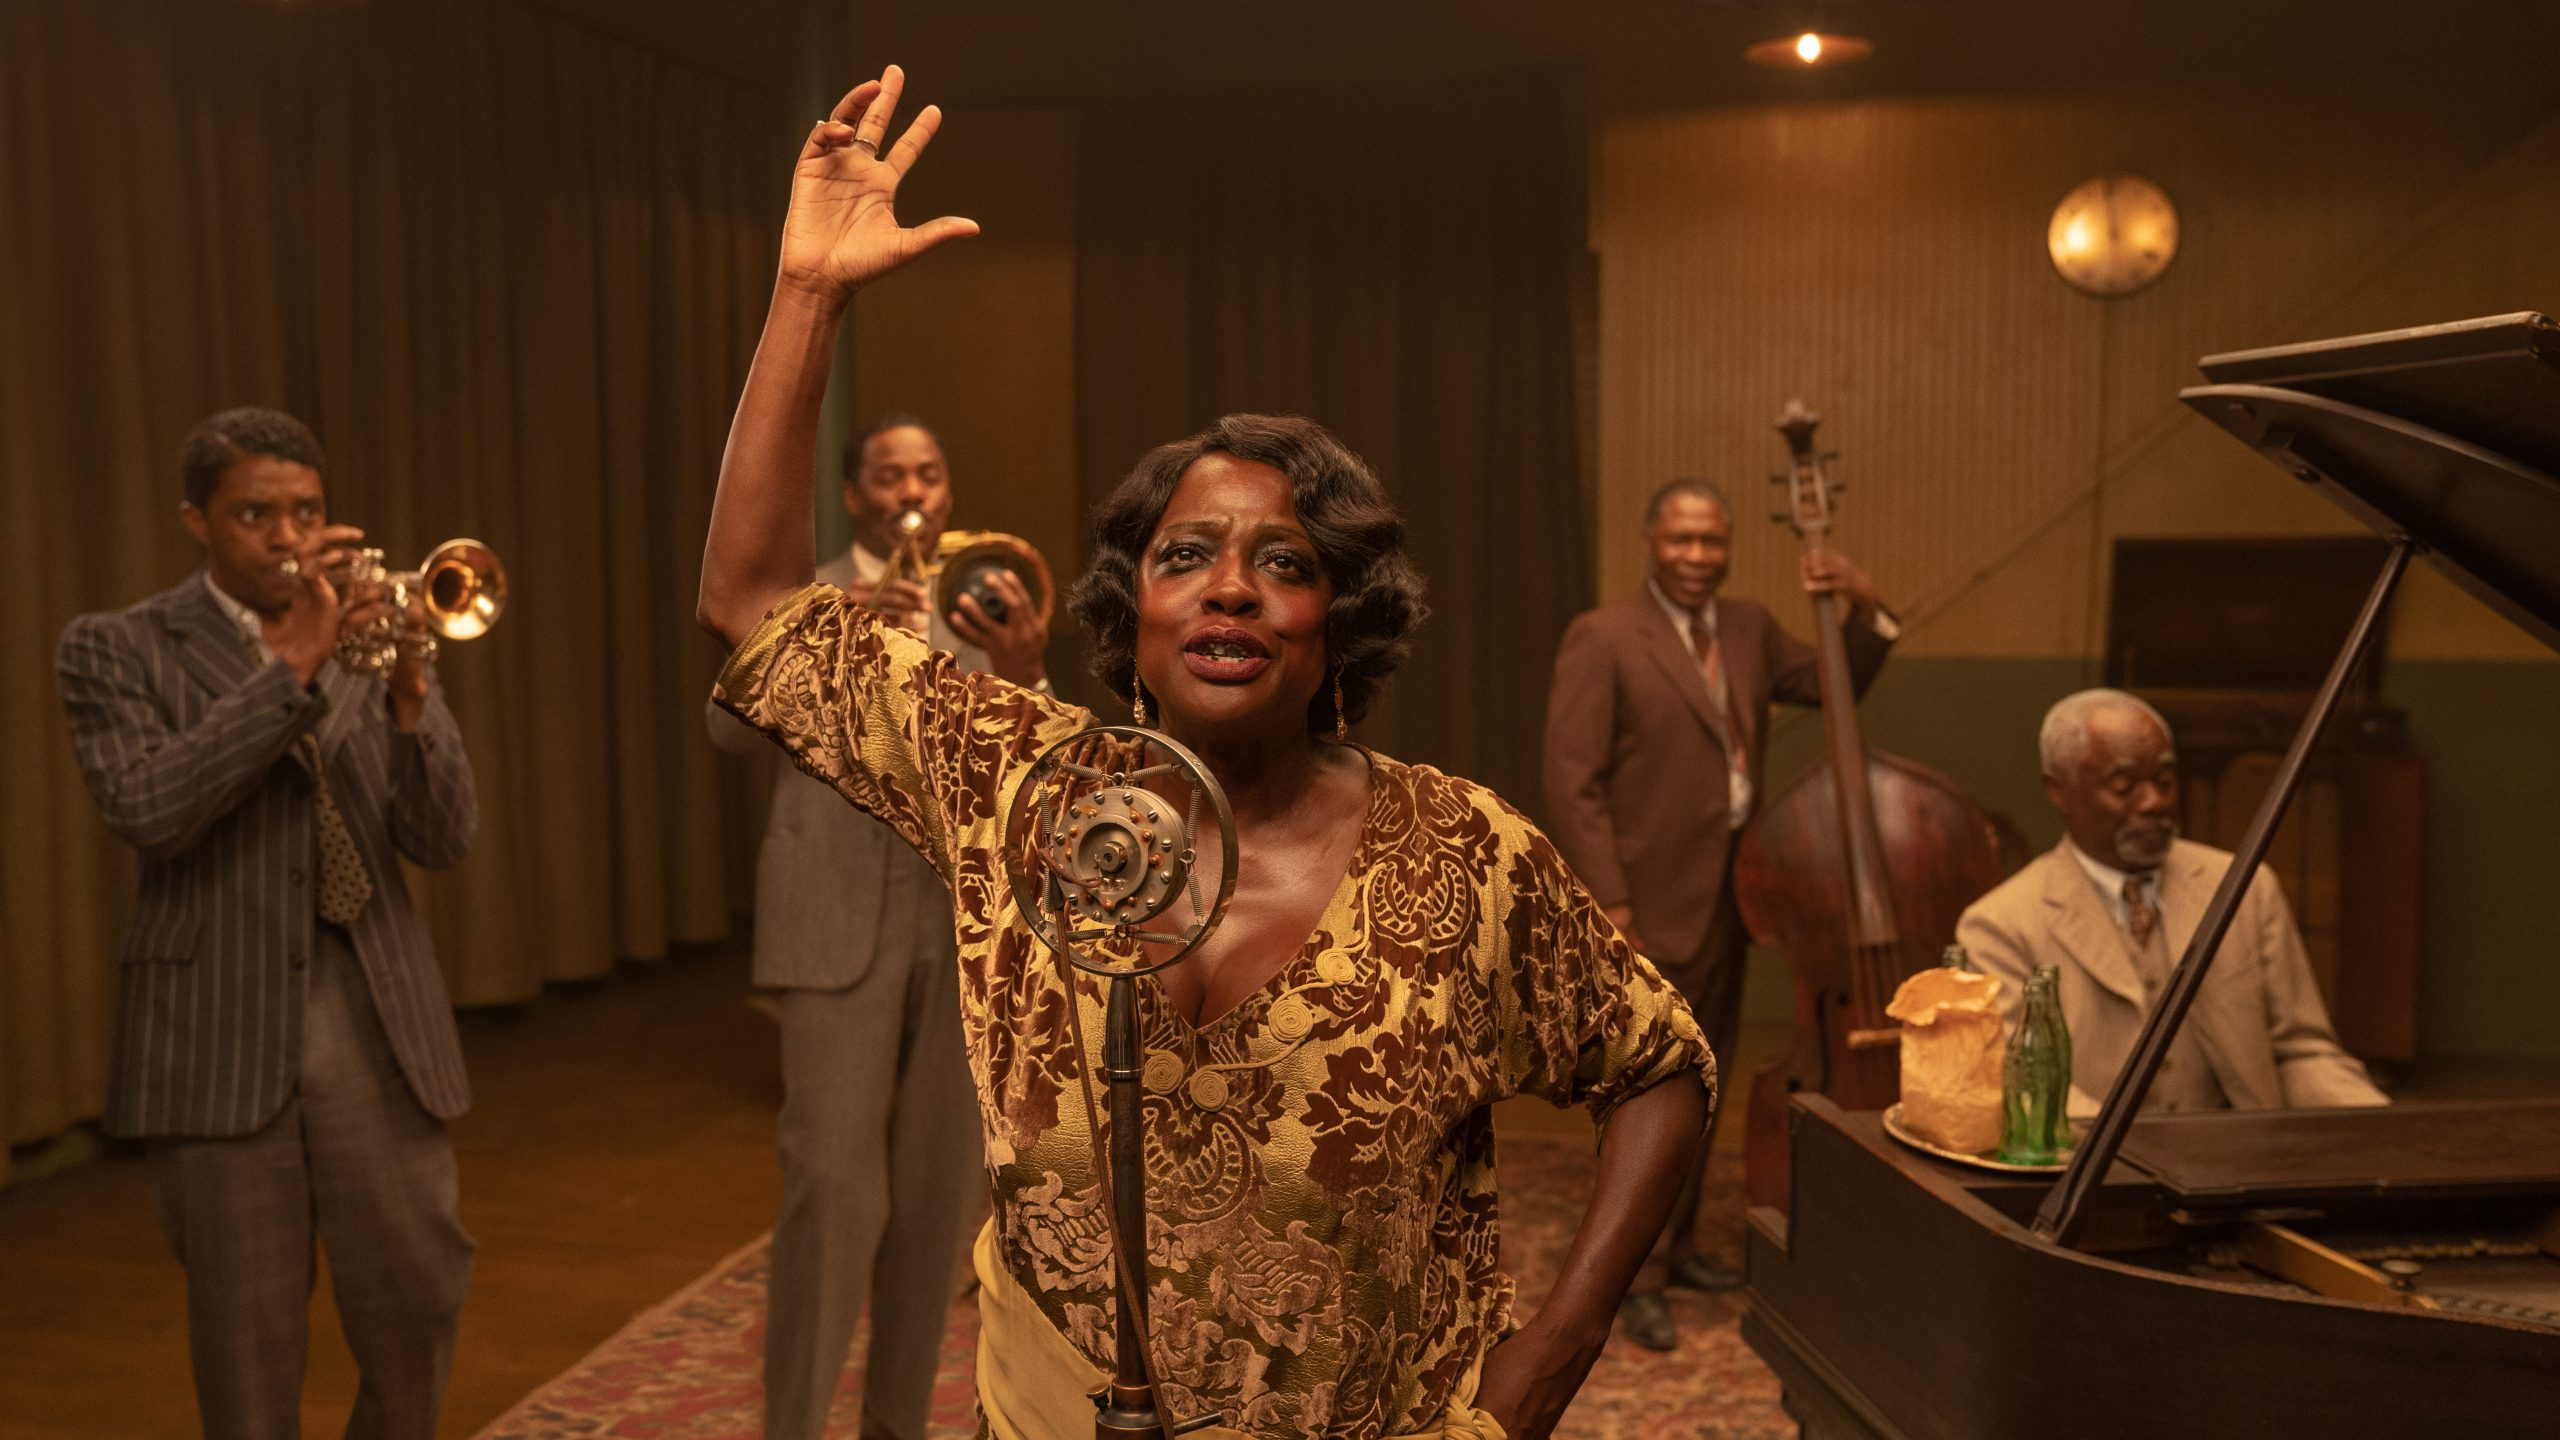 From left to right: Chadwick Boseman, Colman Domingo, Viola Davis, Michael Potts and Glynn Turman in 'Ma Rainey's Black Bottom' on Netflix. (David Lee/NETFLIX)